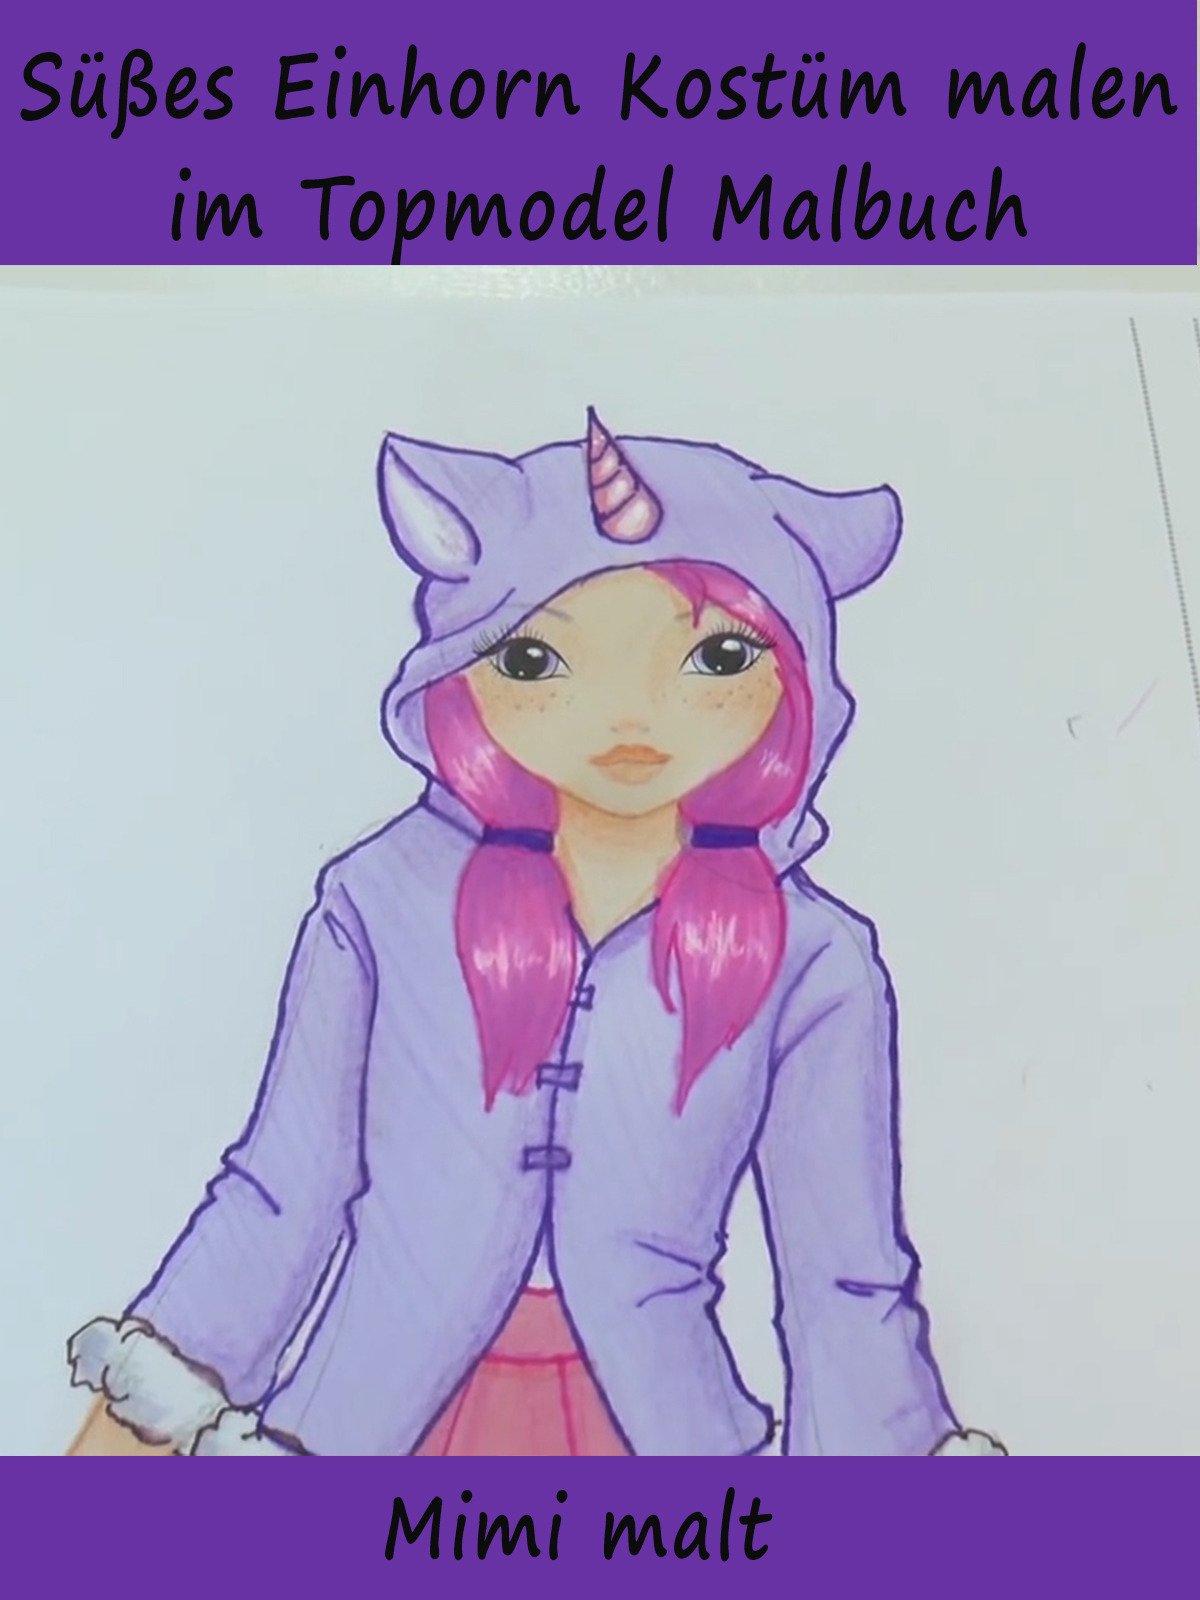 Süßes Einhorn Kostüm malen im Topmodel Malbuch